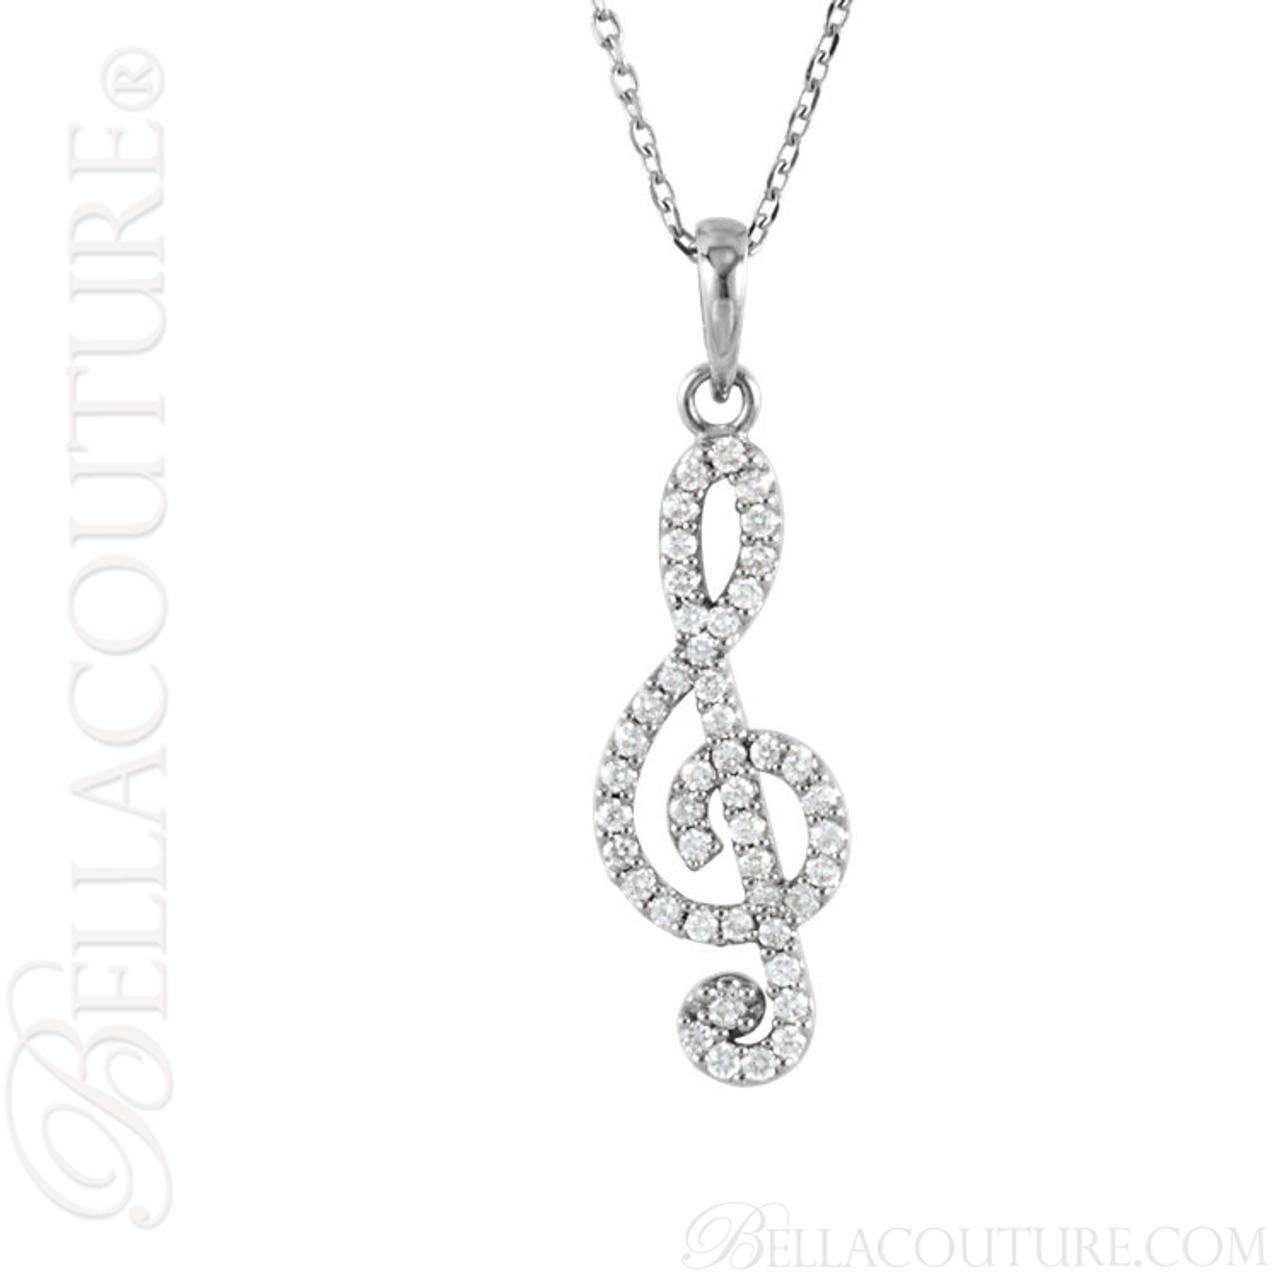 New bella couture fine petite treble clef diamond 14k white gold new bella couture fine petite treble clef diamond 14k white gold pendant necklace aloadofball Images